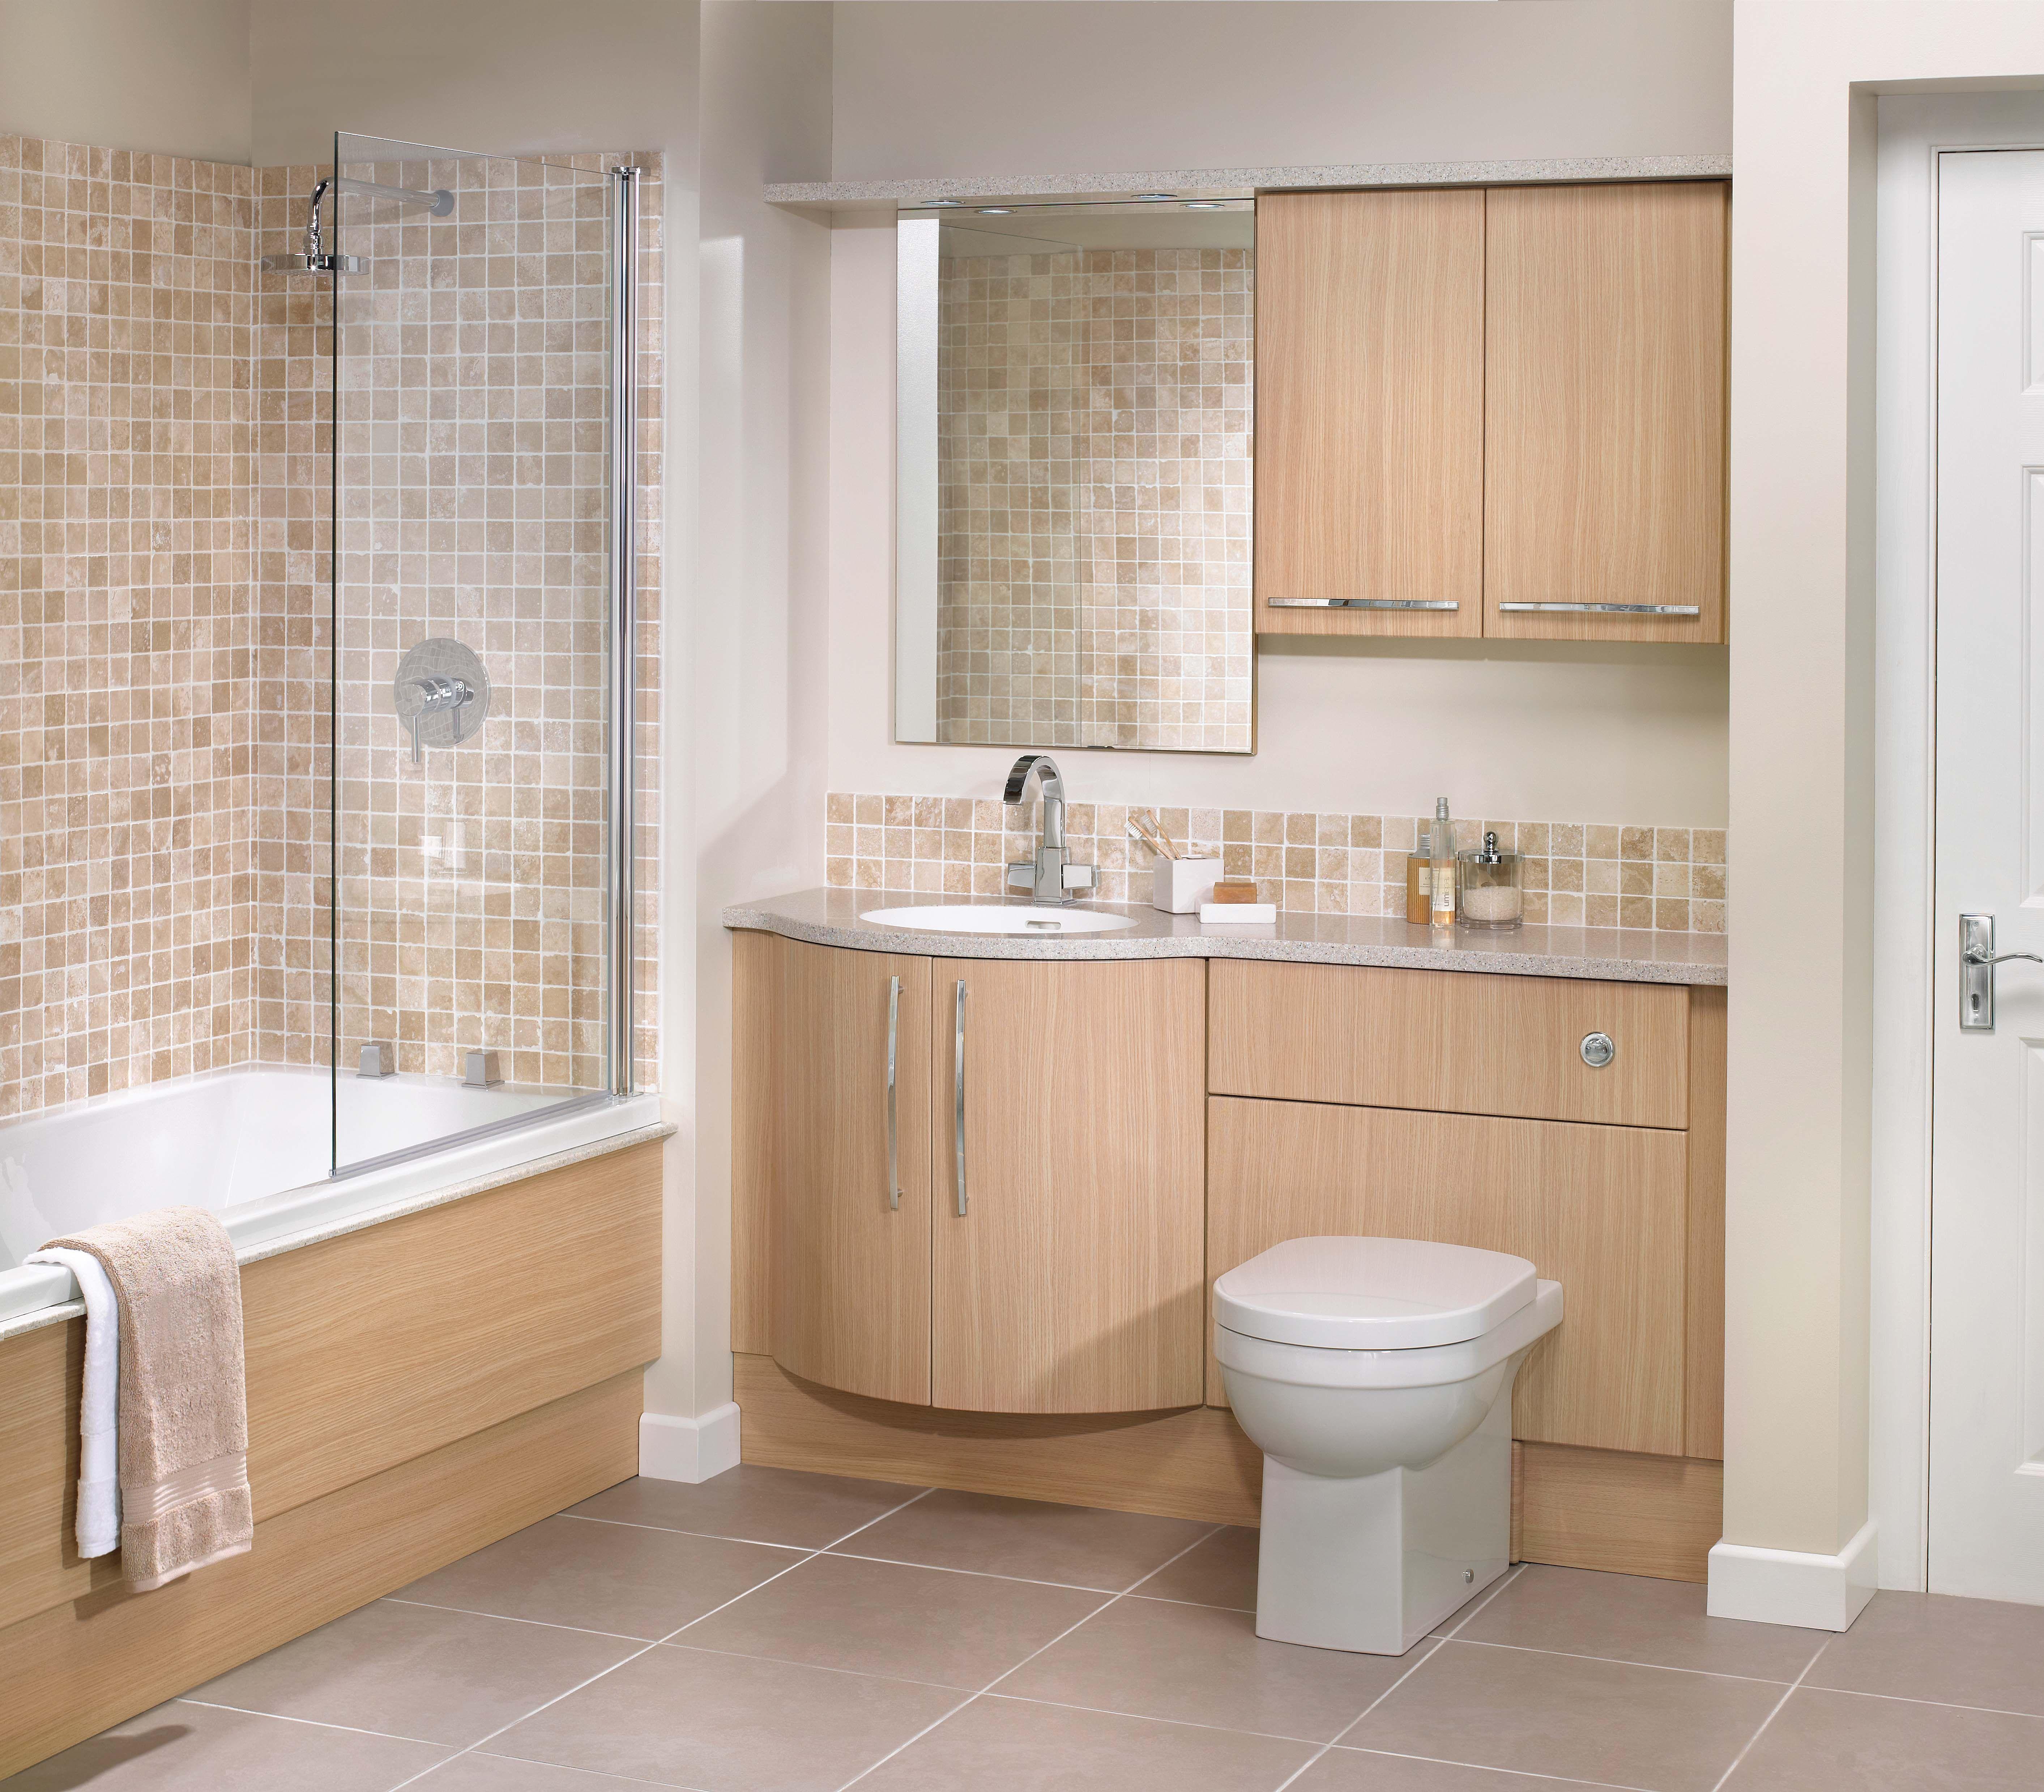 Great Bathrooms On A Budget Bathroom Budget Light Oak Click To Enlarge Launch Sli Bathroom Design Luxury Bathroom Vanity Designs Small Bathroom With Tub